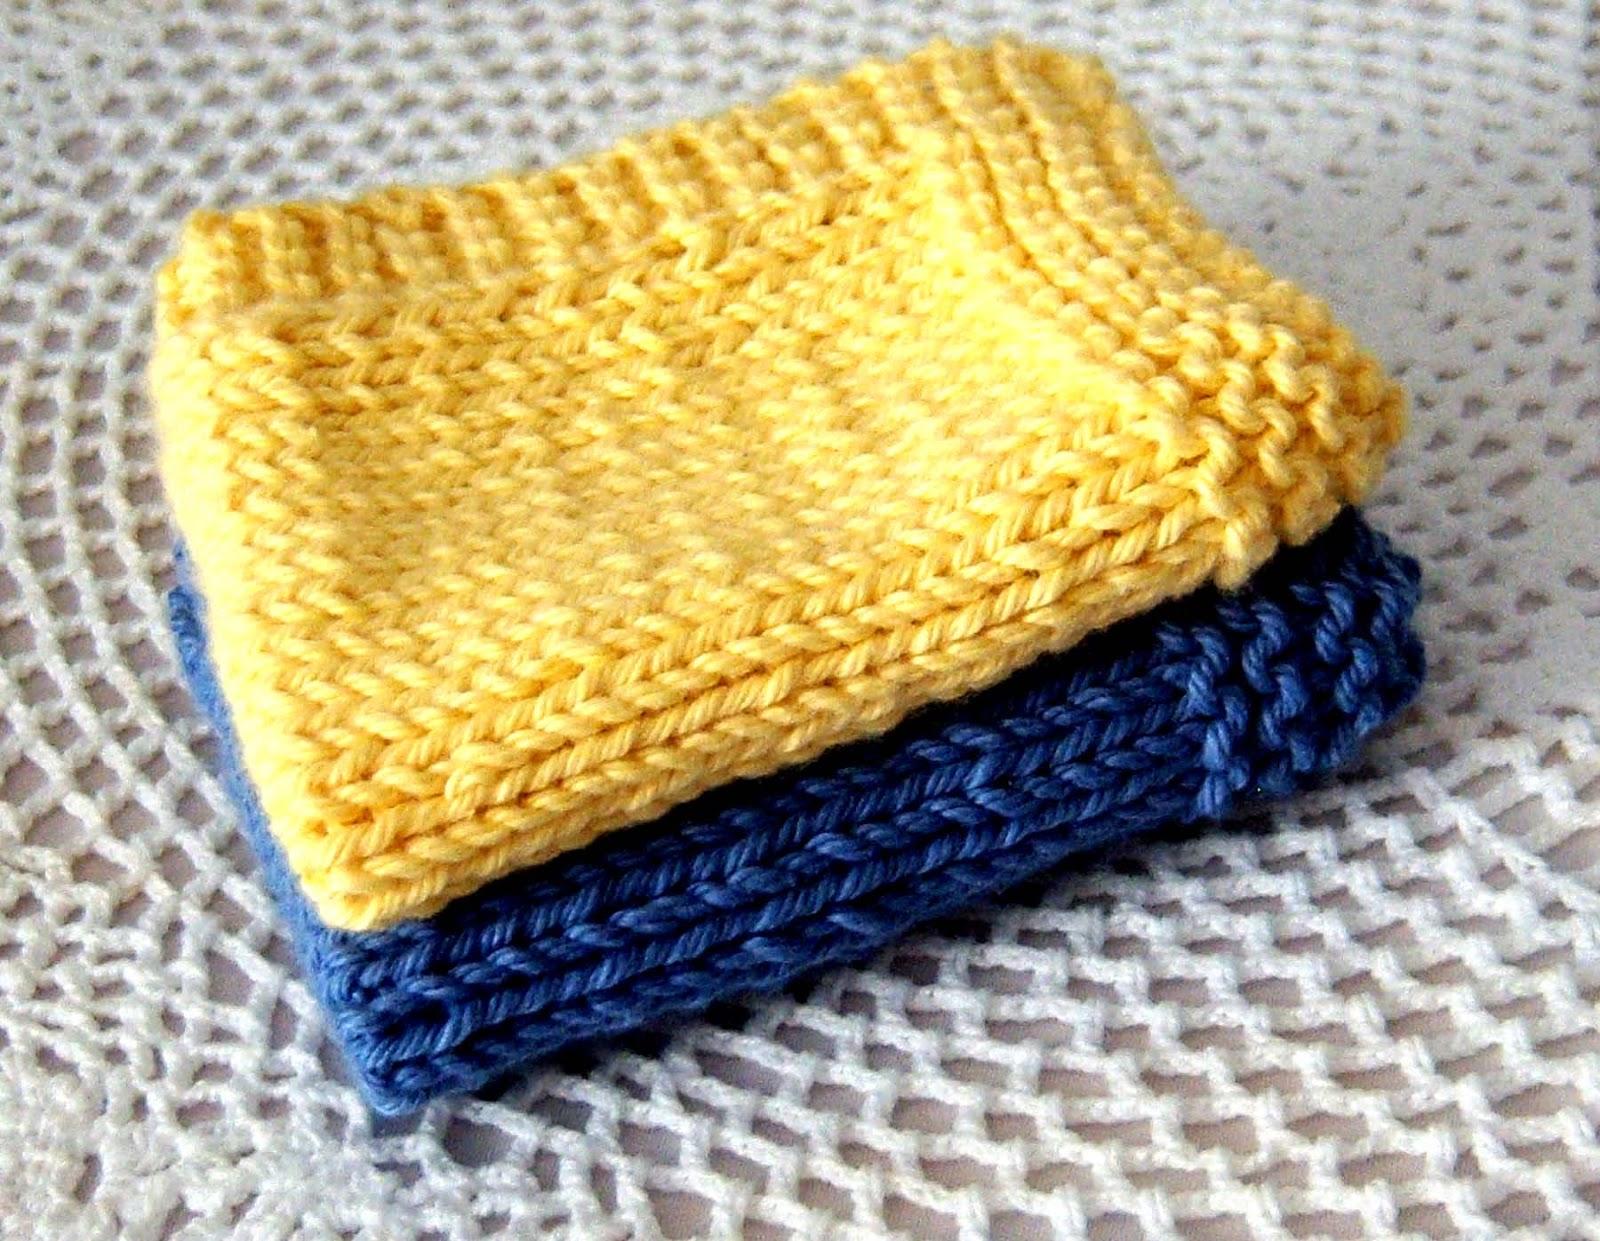 Shoregirl's Creations: Knitted Dishcloths